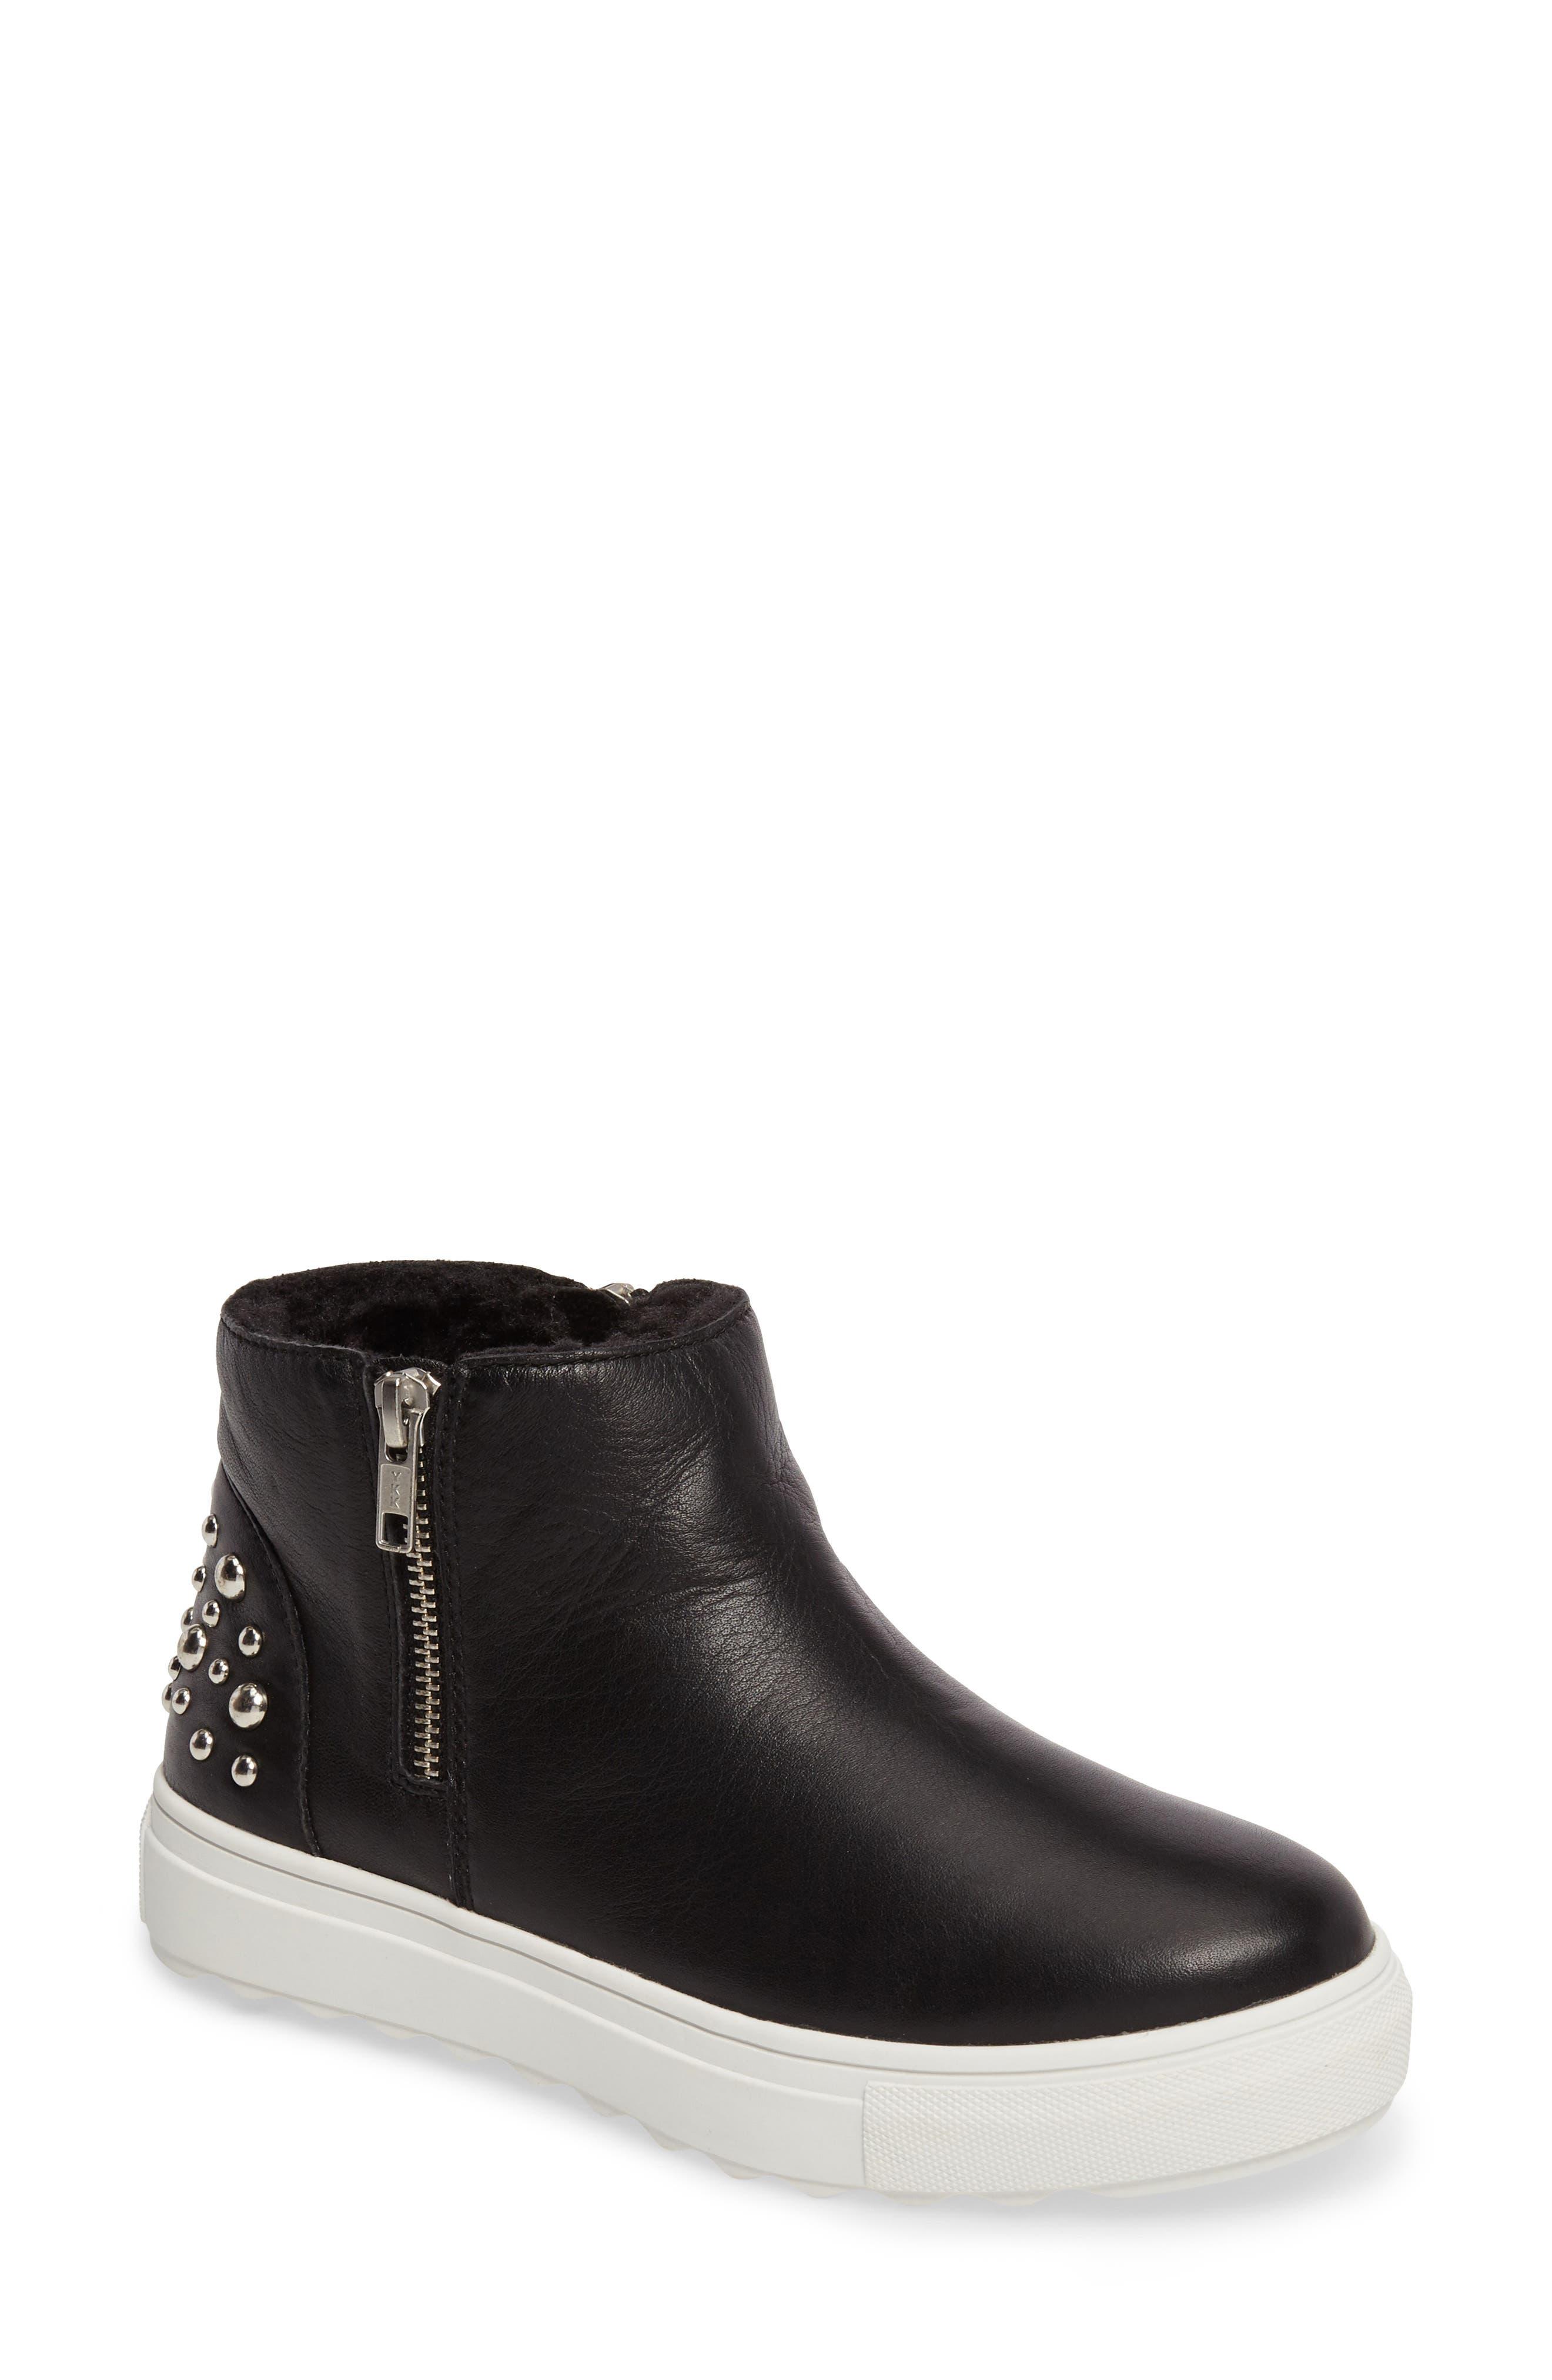 Pele Boot,                             Main thumbnail 1, color,                             Black Leather